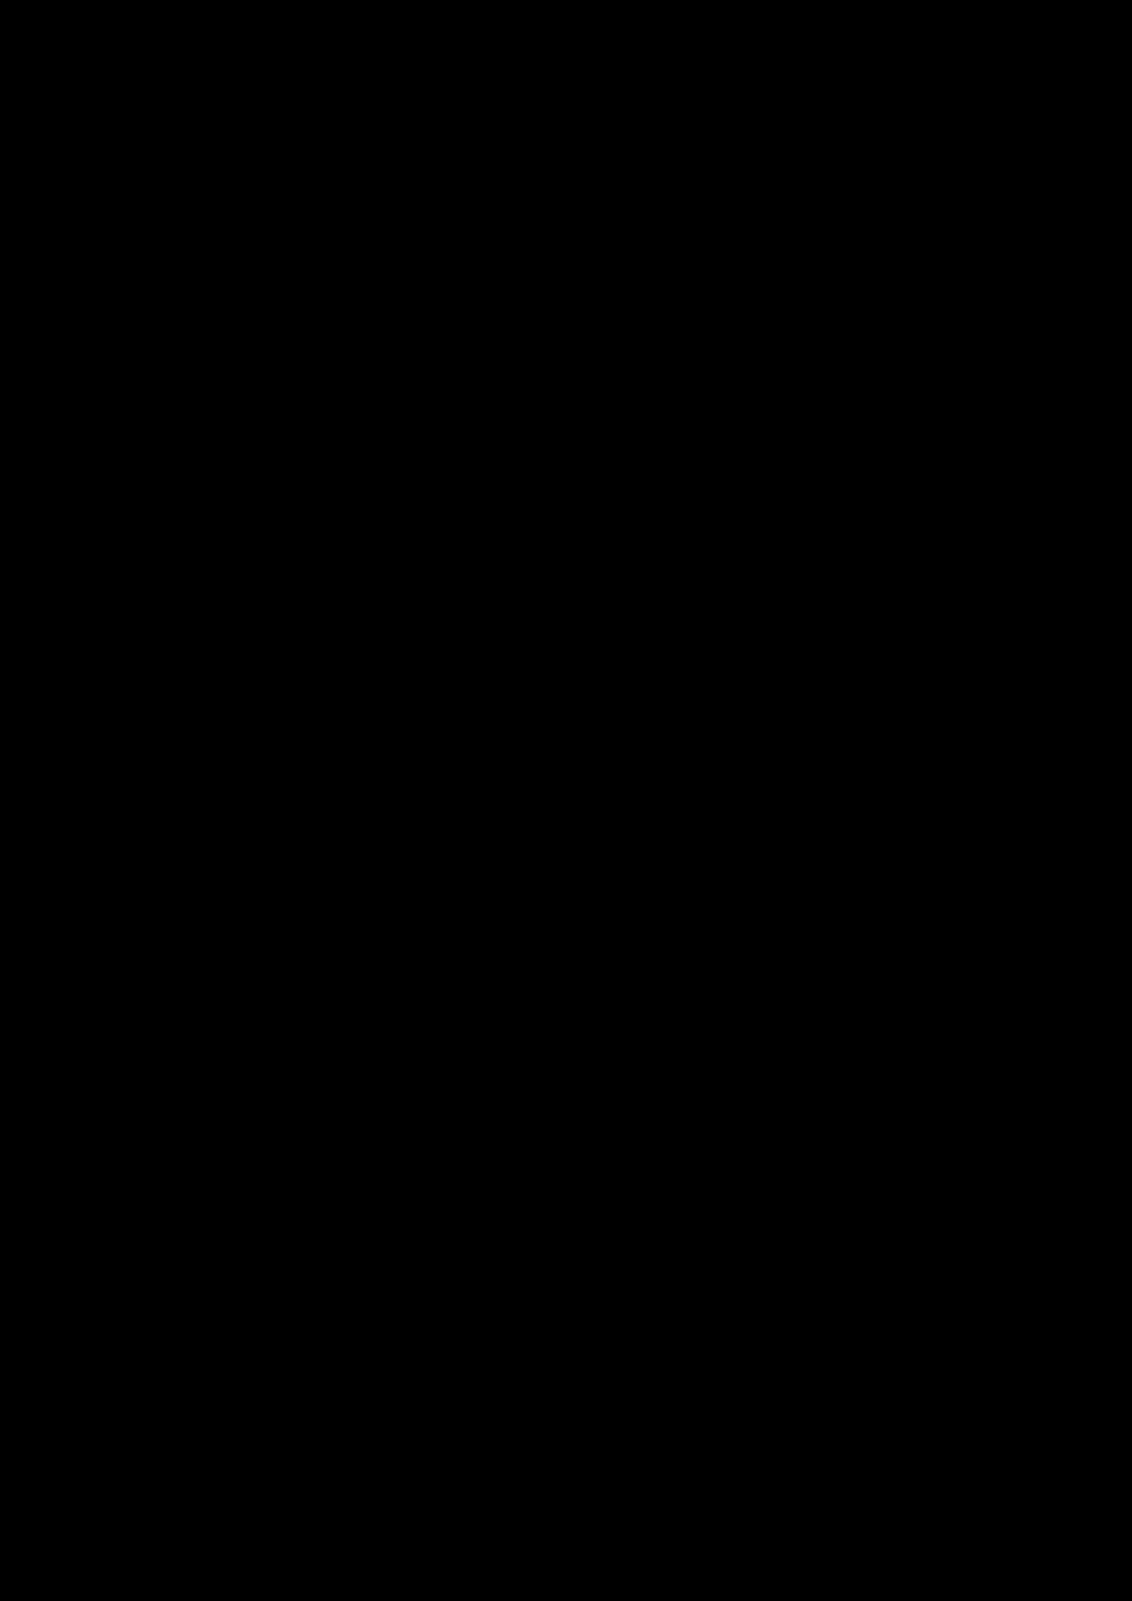 Belyiy sokol slide, Image 178